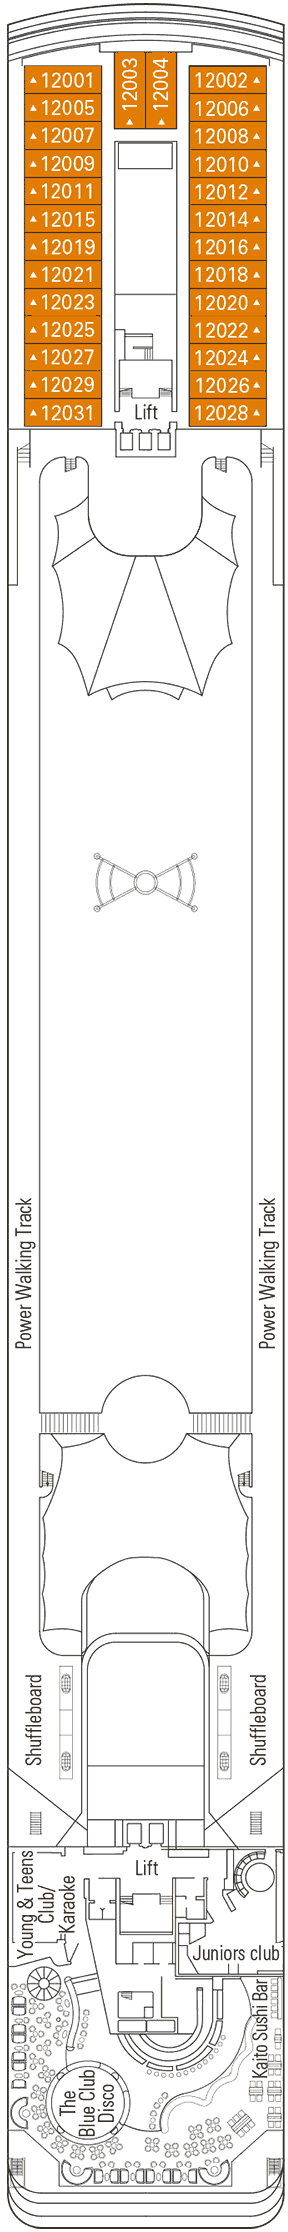 MSC Lirica - Rossini Deck